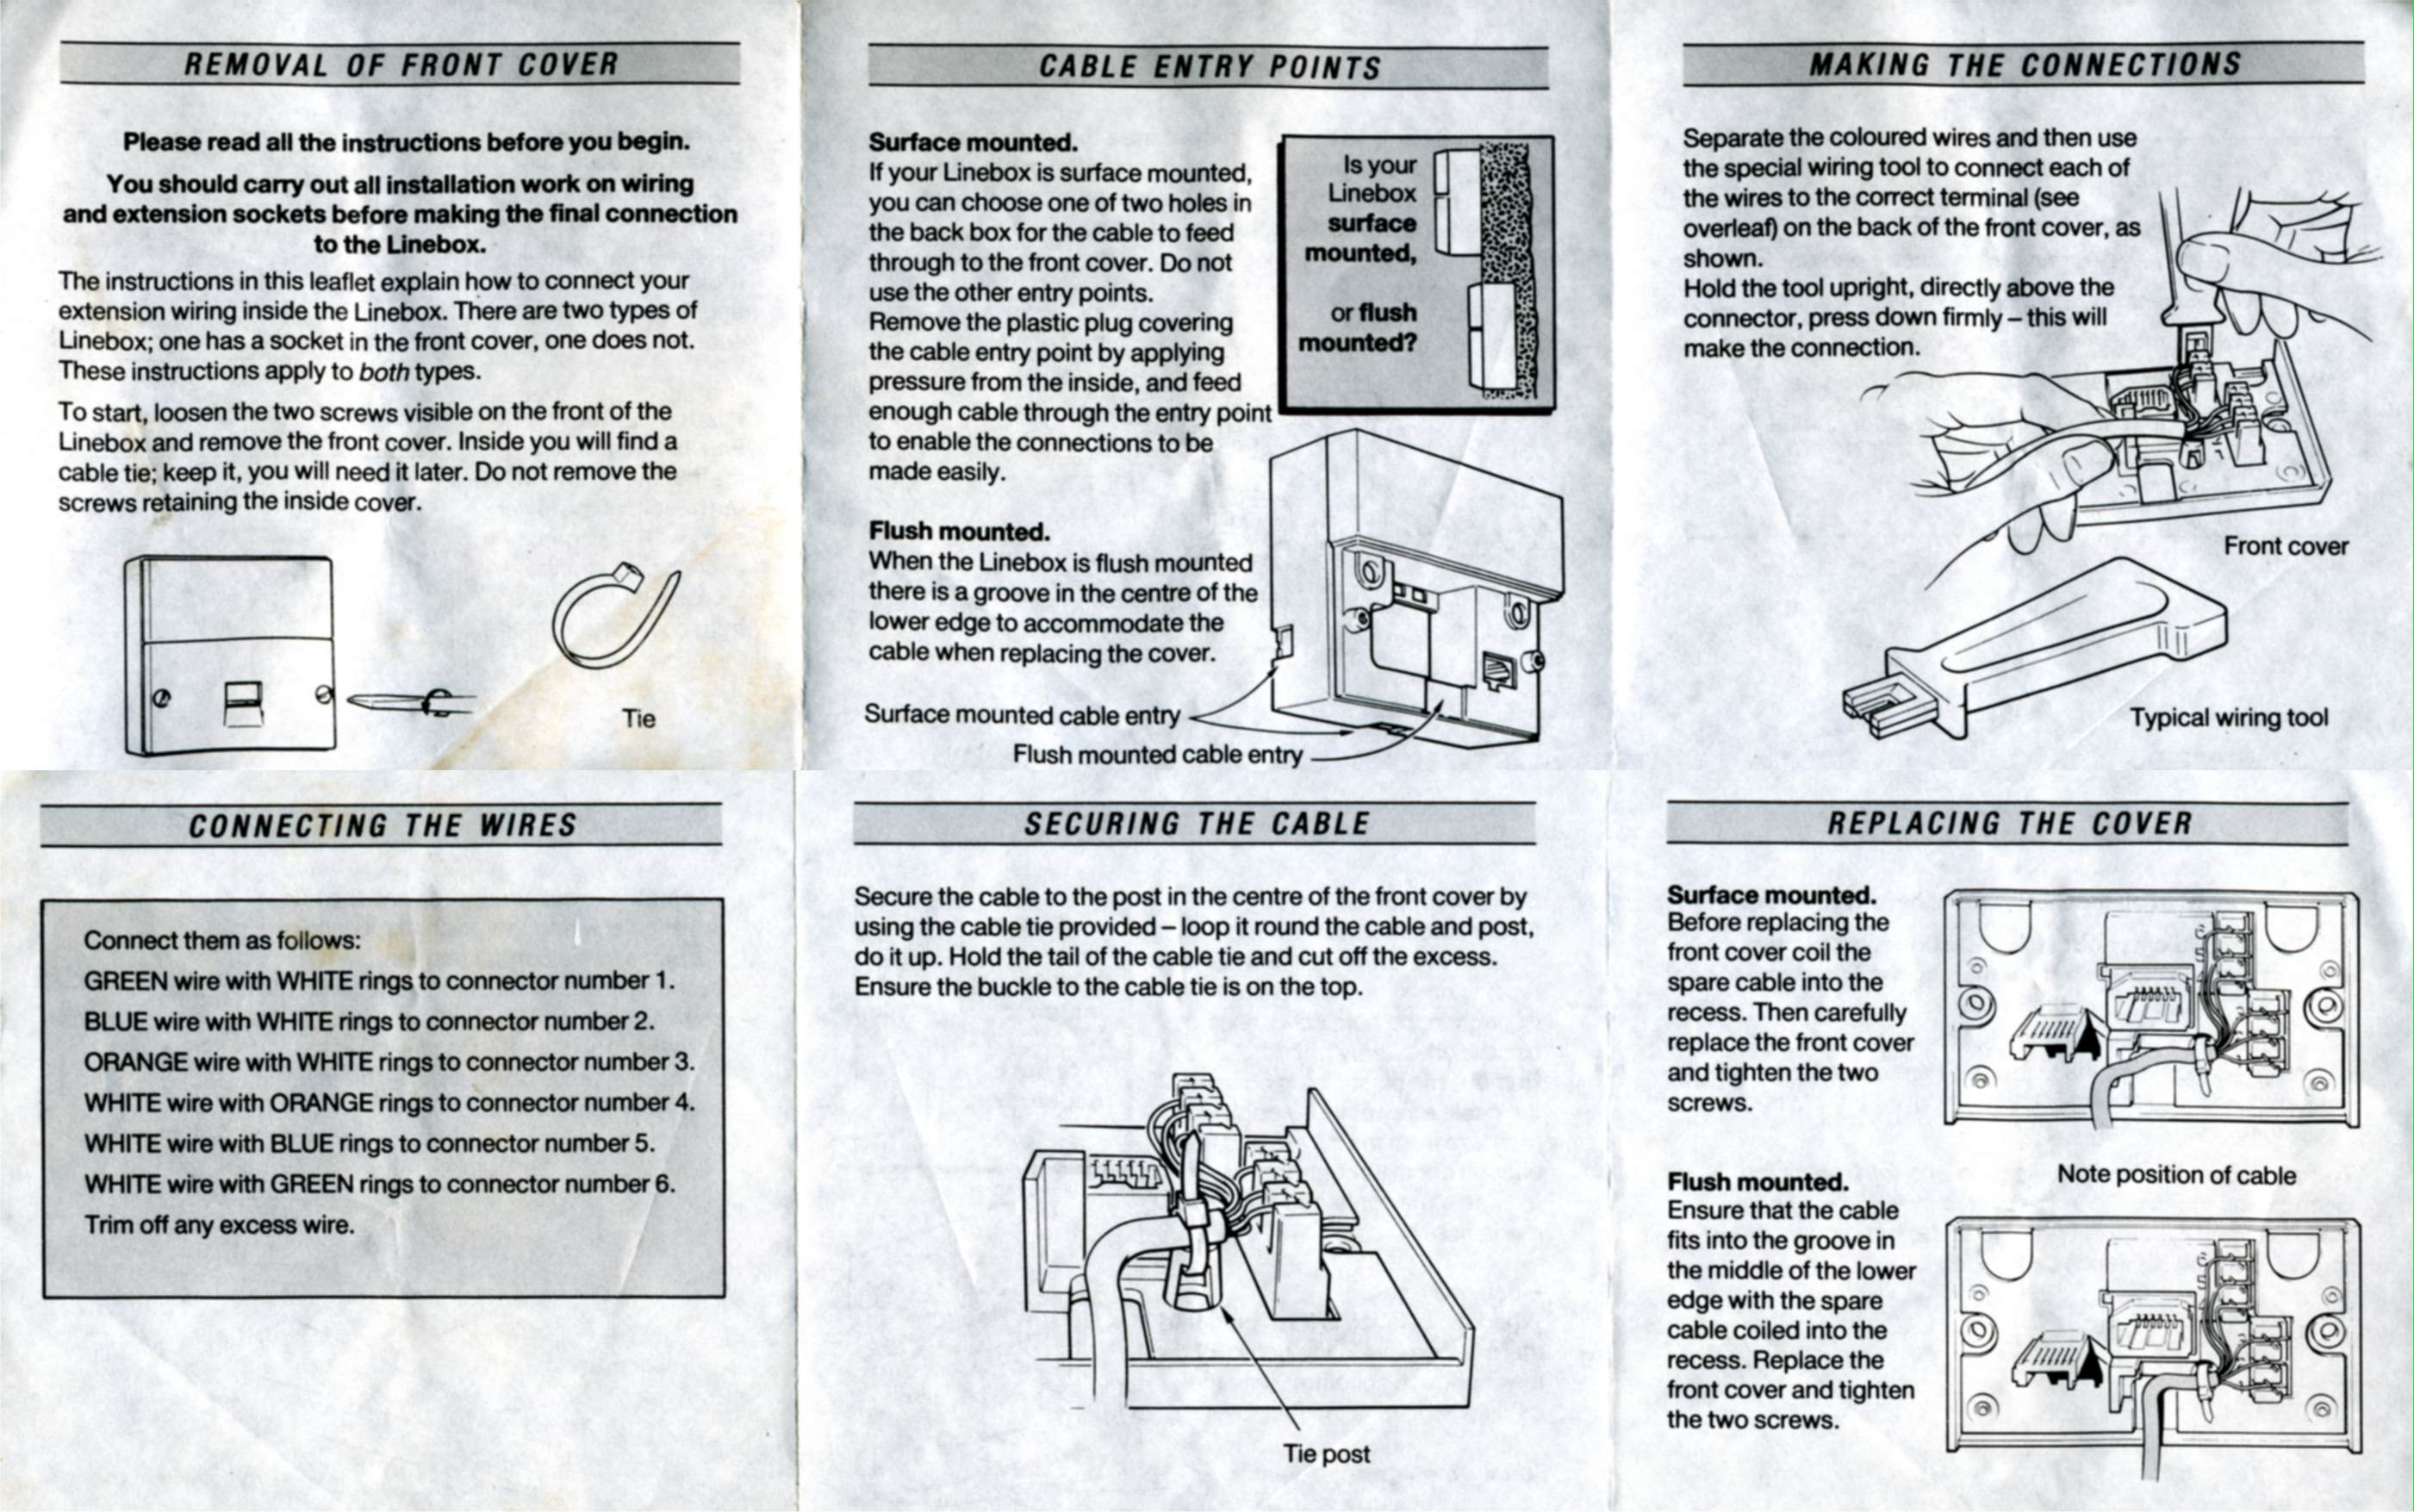 Wiring Information - Telephone Wiring Diagram